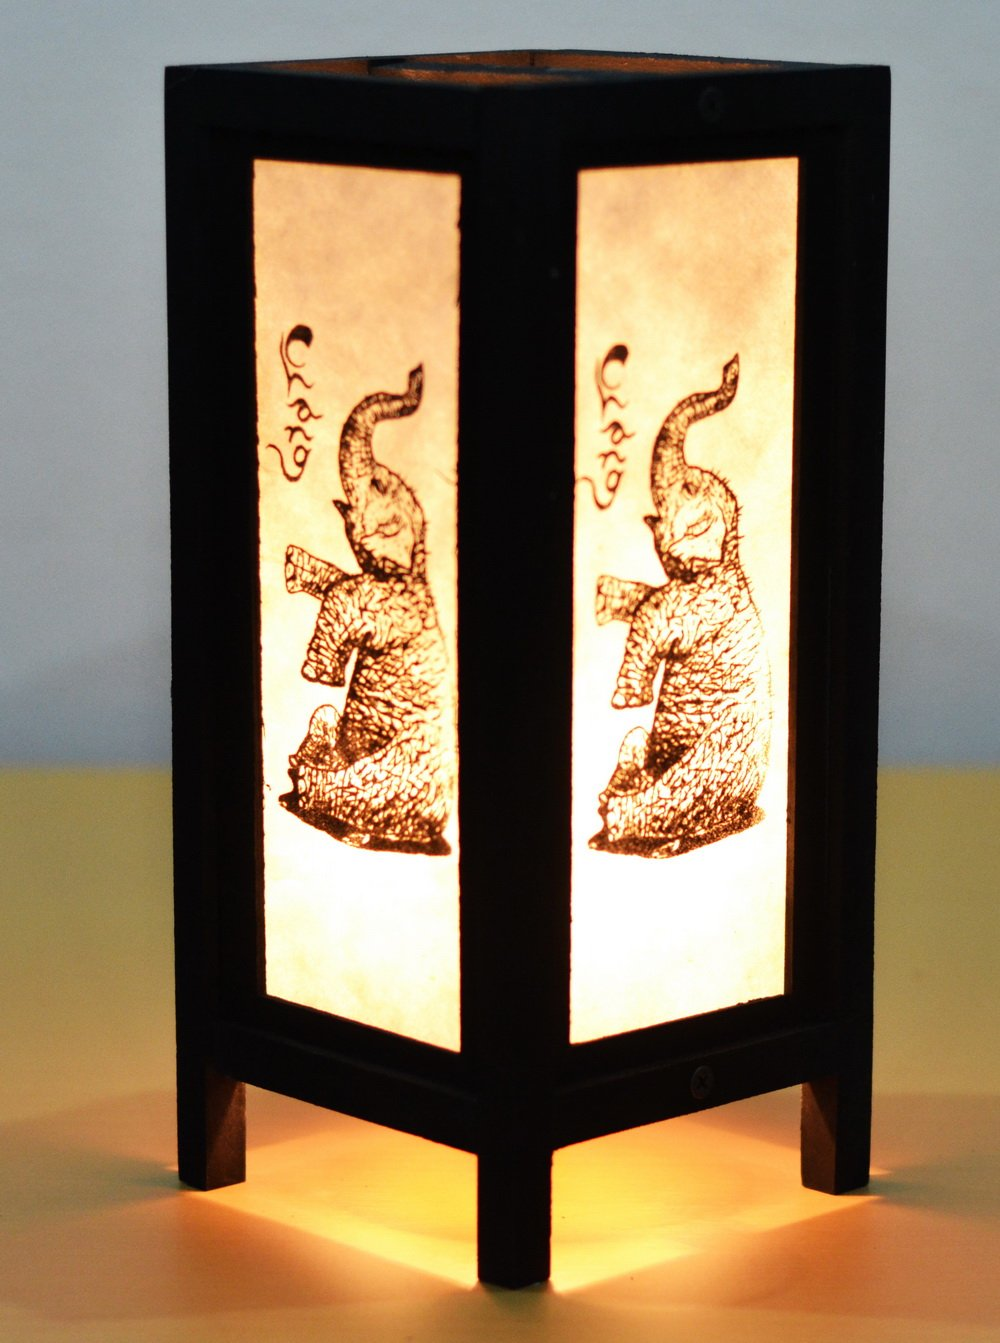 Decorative Lamp Thai Vintage Handmade Asian Oriental Chang Bedside Table Light Floor Wood Paper Lamp Shades Home Bedroom Garden Decoration Modern Design